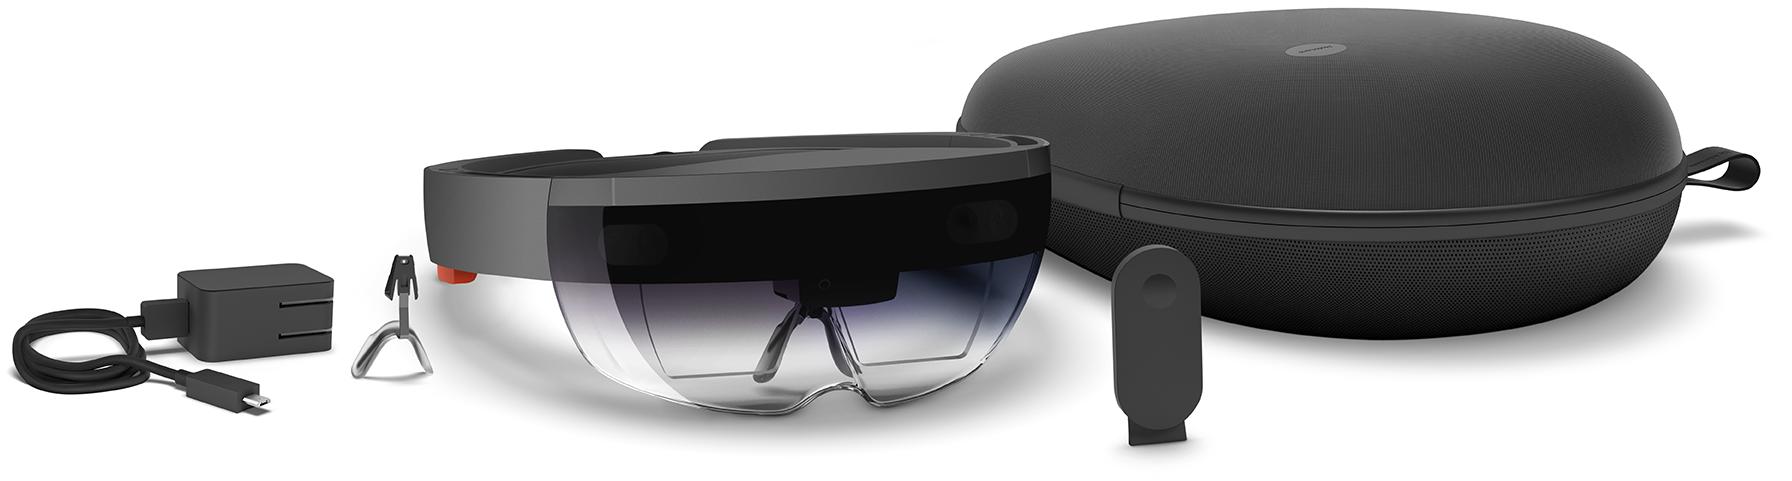 Microsoft HoloLens Development Edition image 001